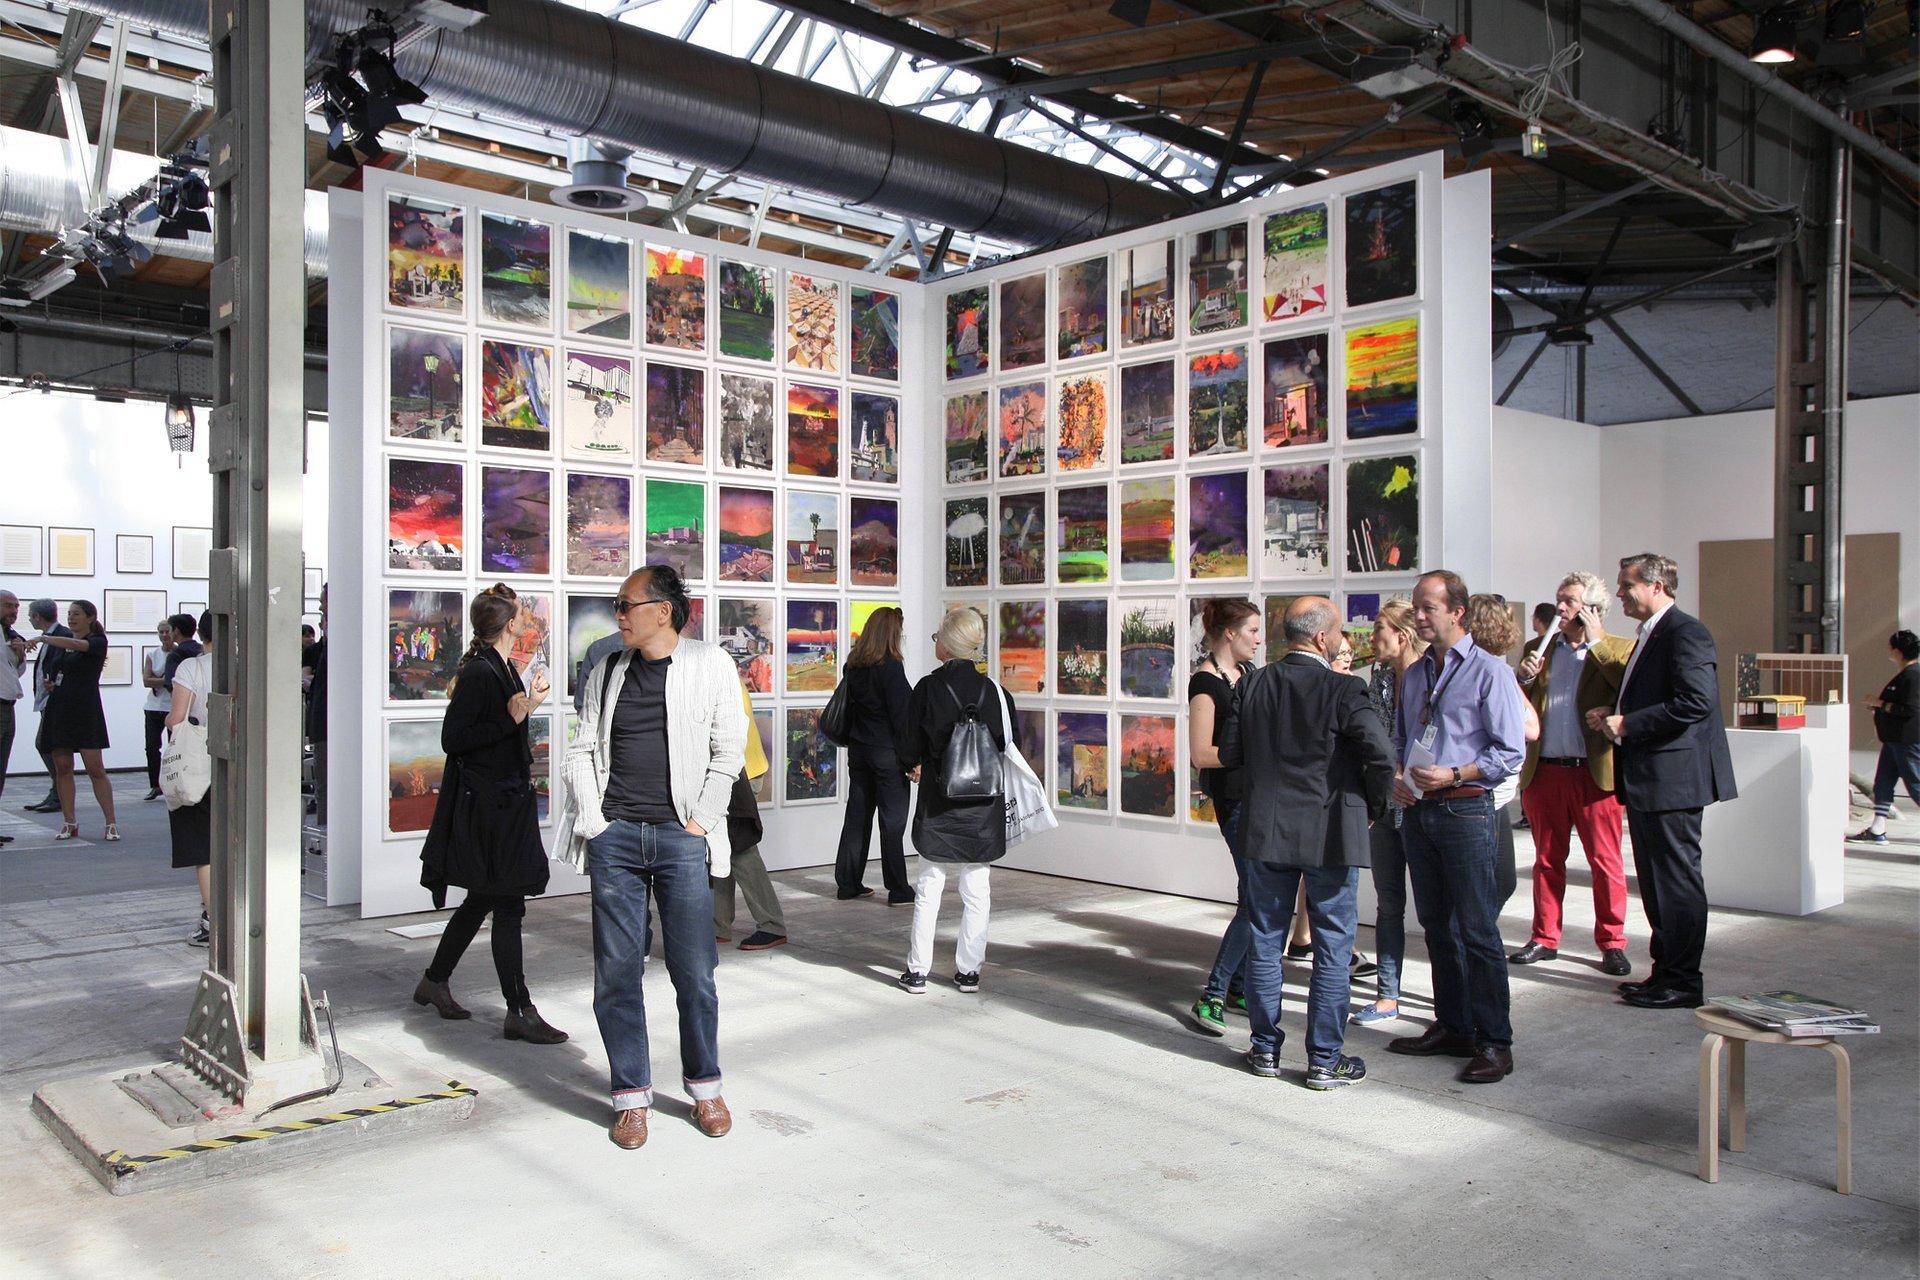 abc Austellungsansicht / installation view, 2015, Blain Southern, Marius Bercea 2019